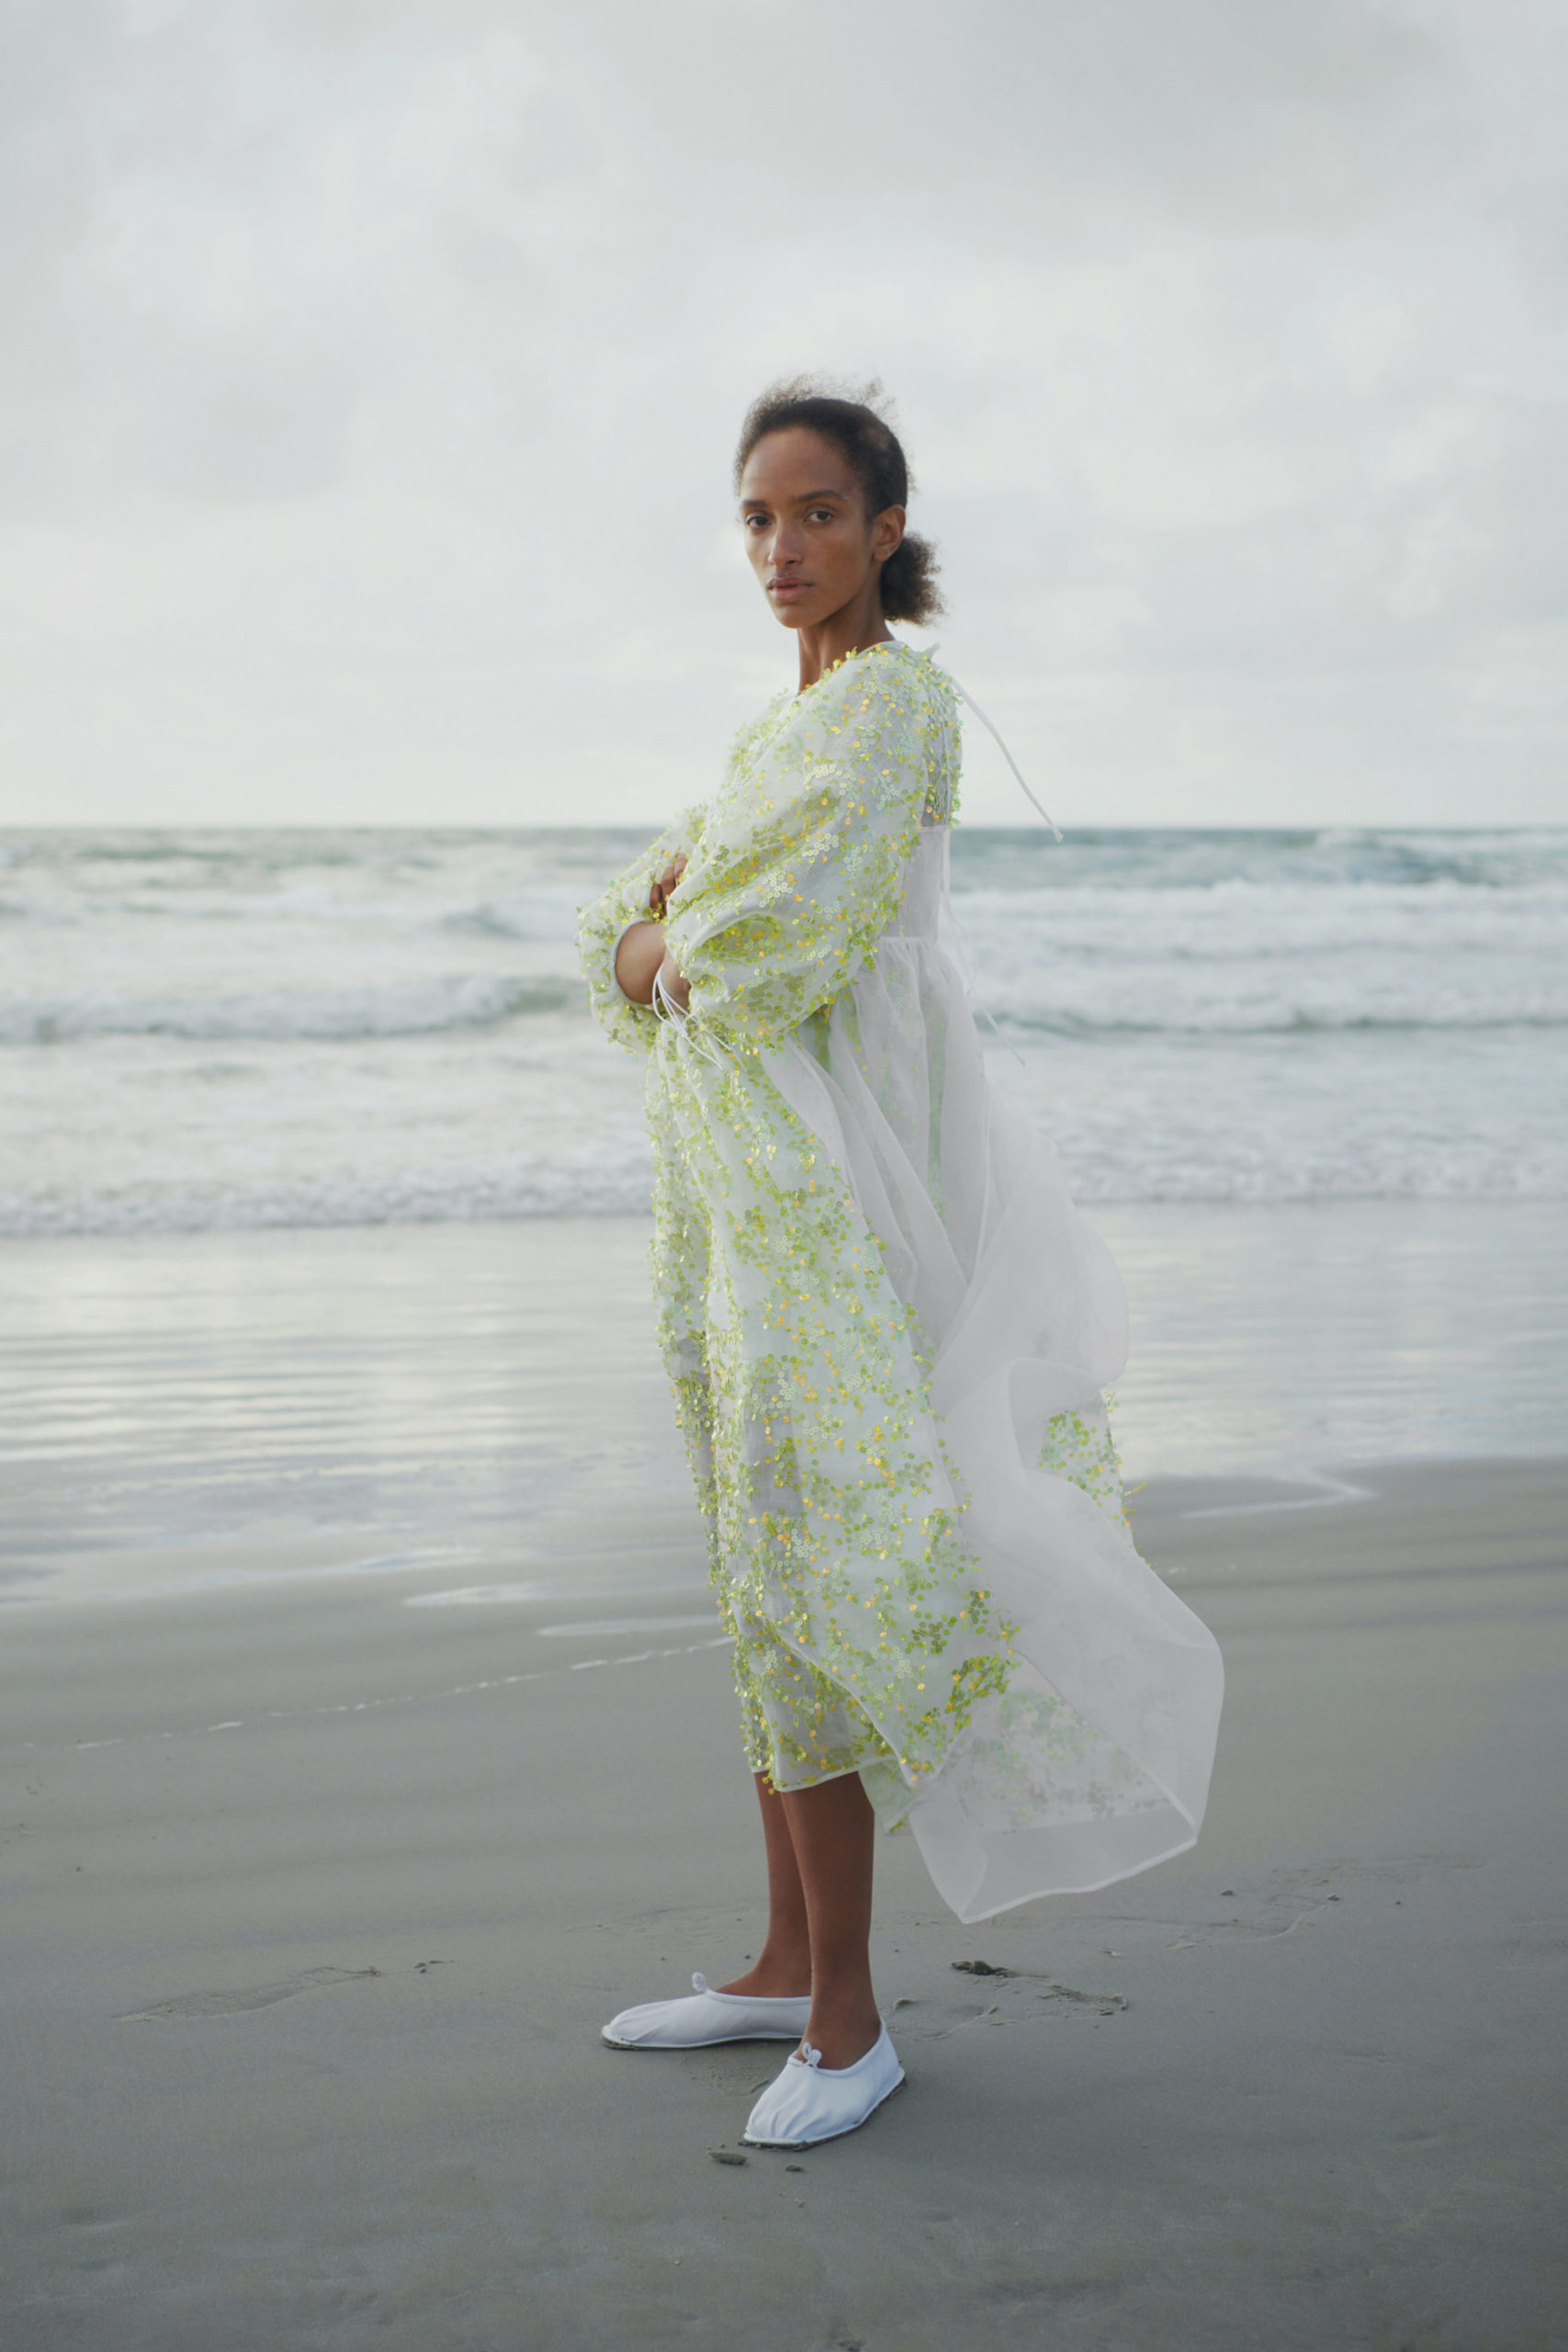 Ментоловый образ от Cecilie Bahnsen Ready To Wear весна-лето 2021